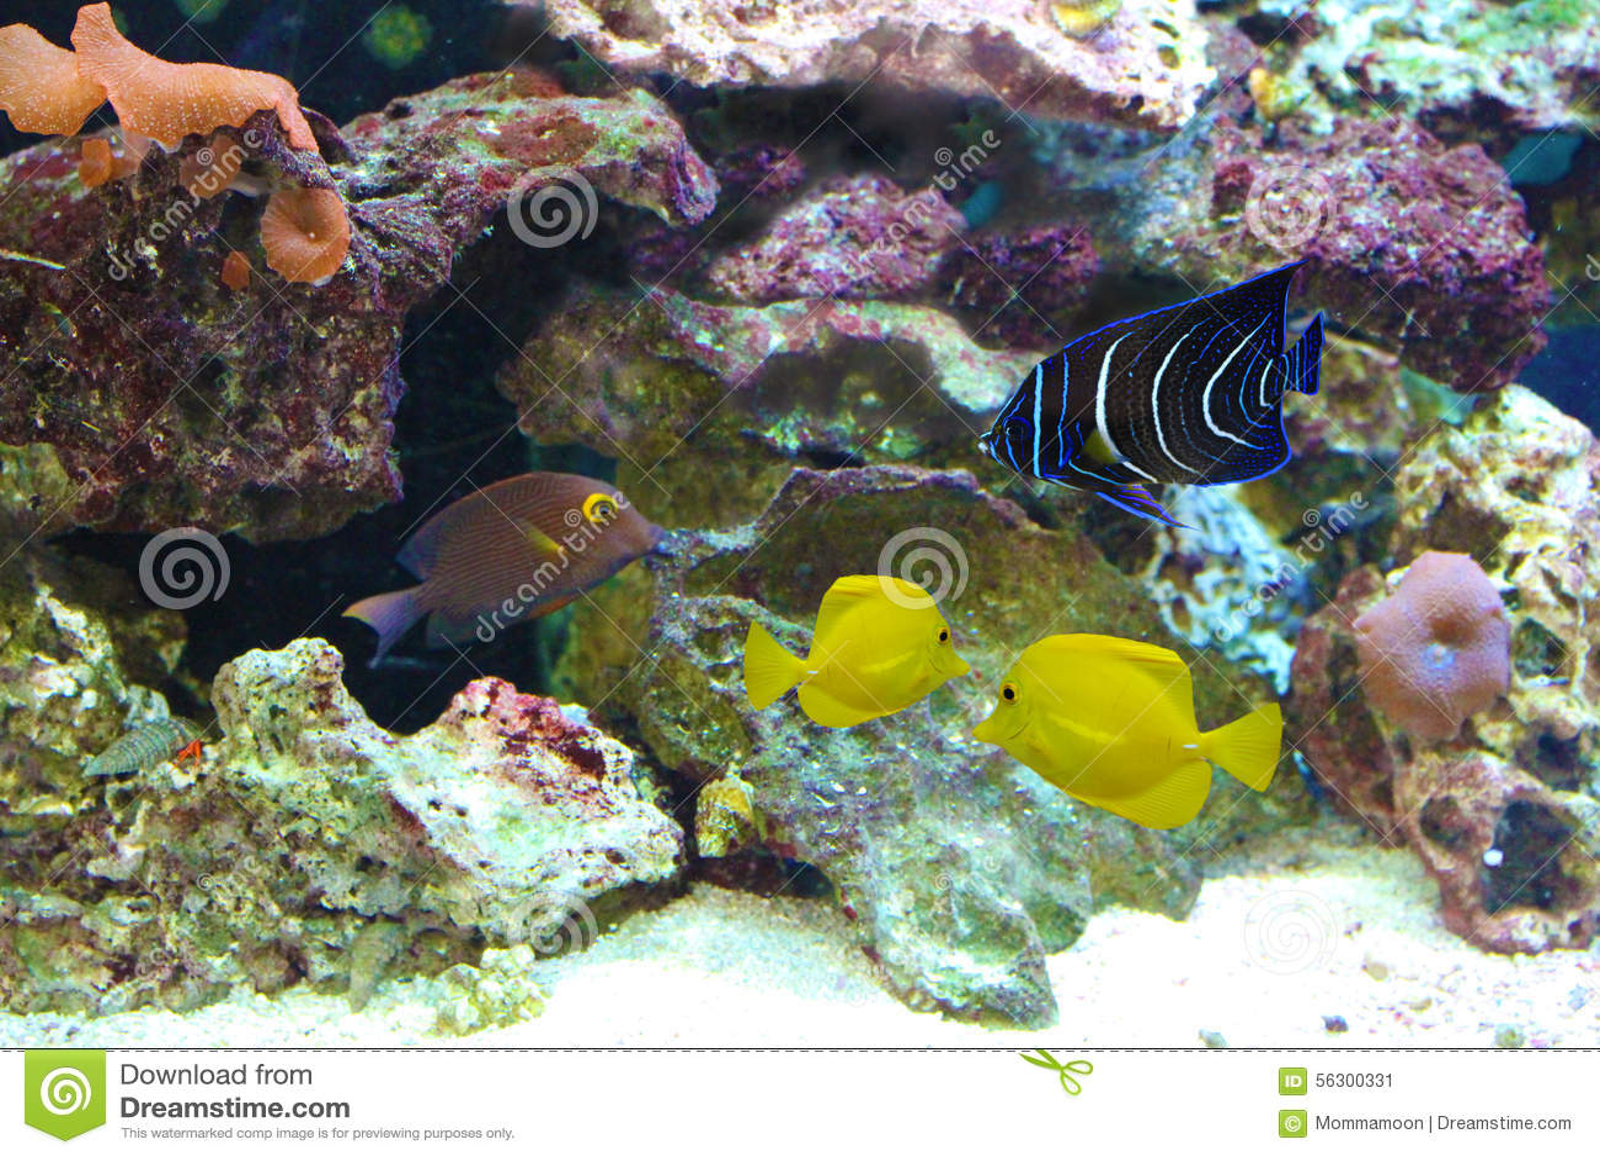 Marine fish tank yellow water the free information for Yellow fish tank water